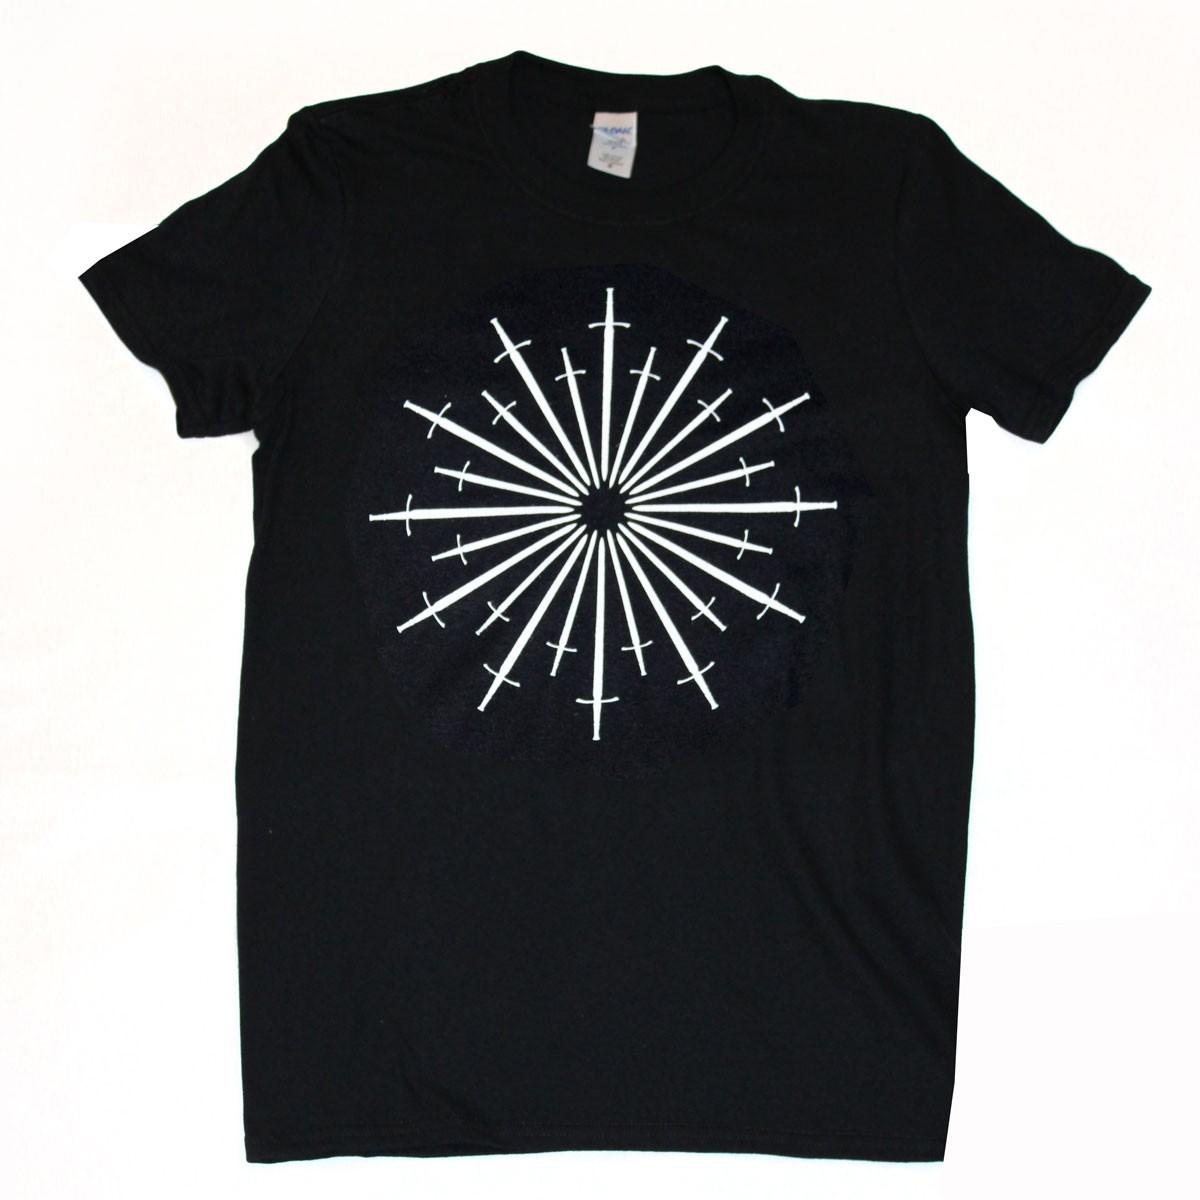 Matthew Brindle – t-shirt